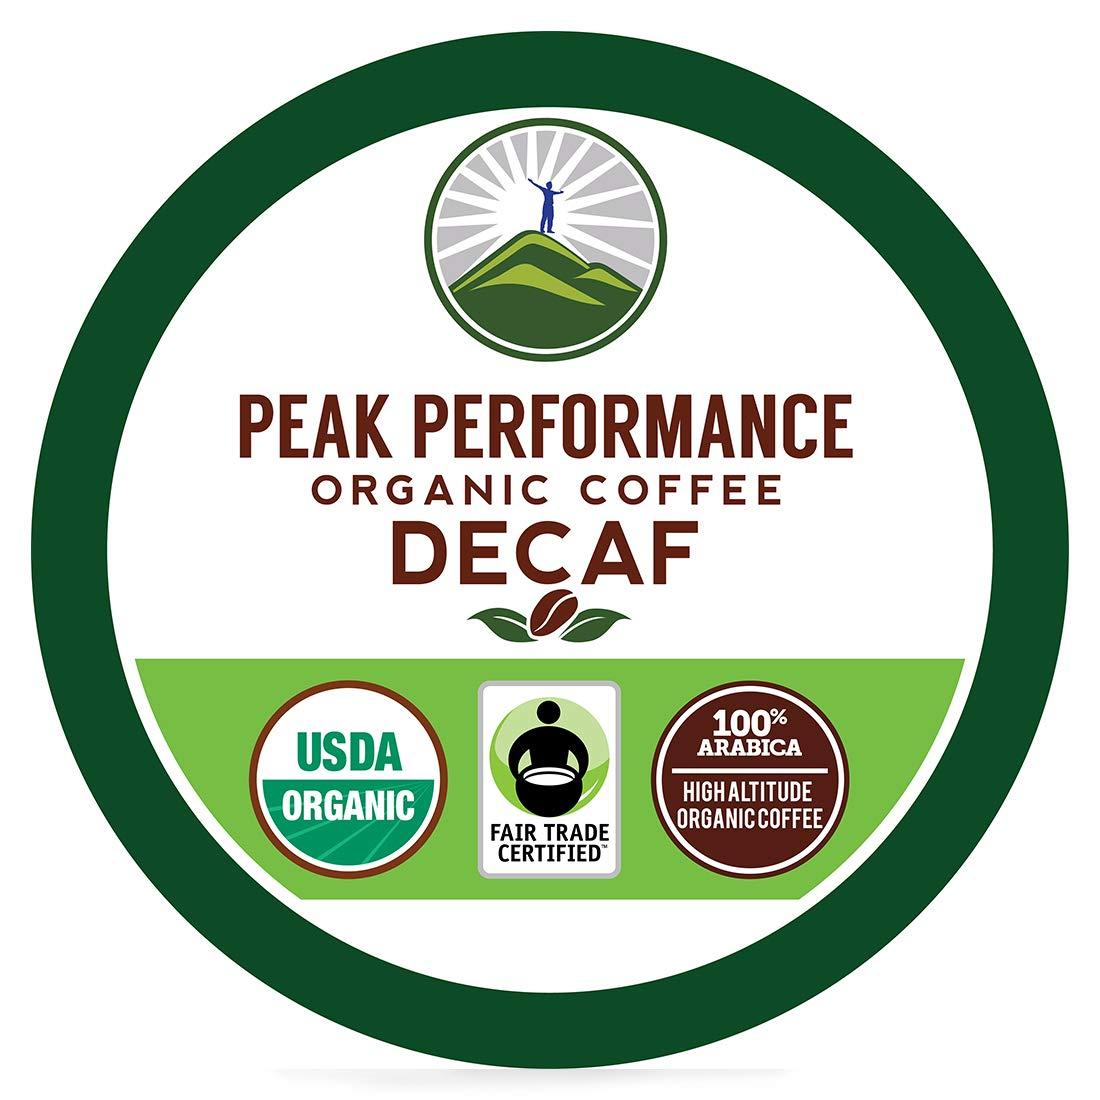 Organic Decaf K Cups - Peak Performance High Altitude Organic Decaf Coffee Pods For High Performance Individuals. Fair Trade Beans Organic Medium Roast K Cup Single Serve Keurig Decaffeinated 24 KCups